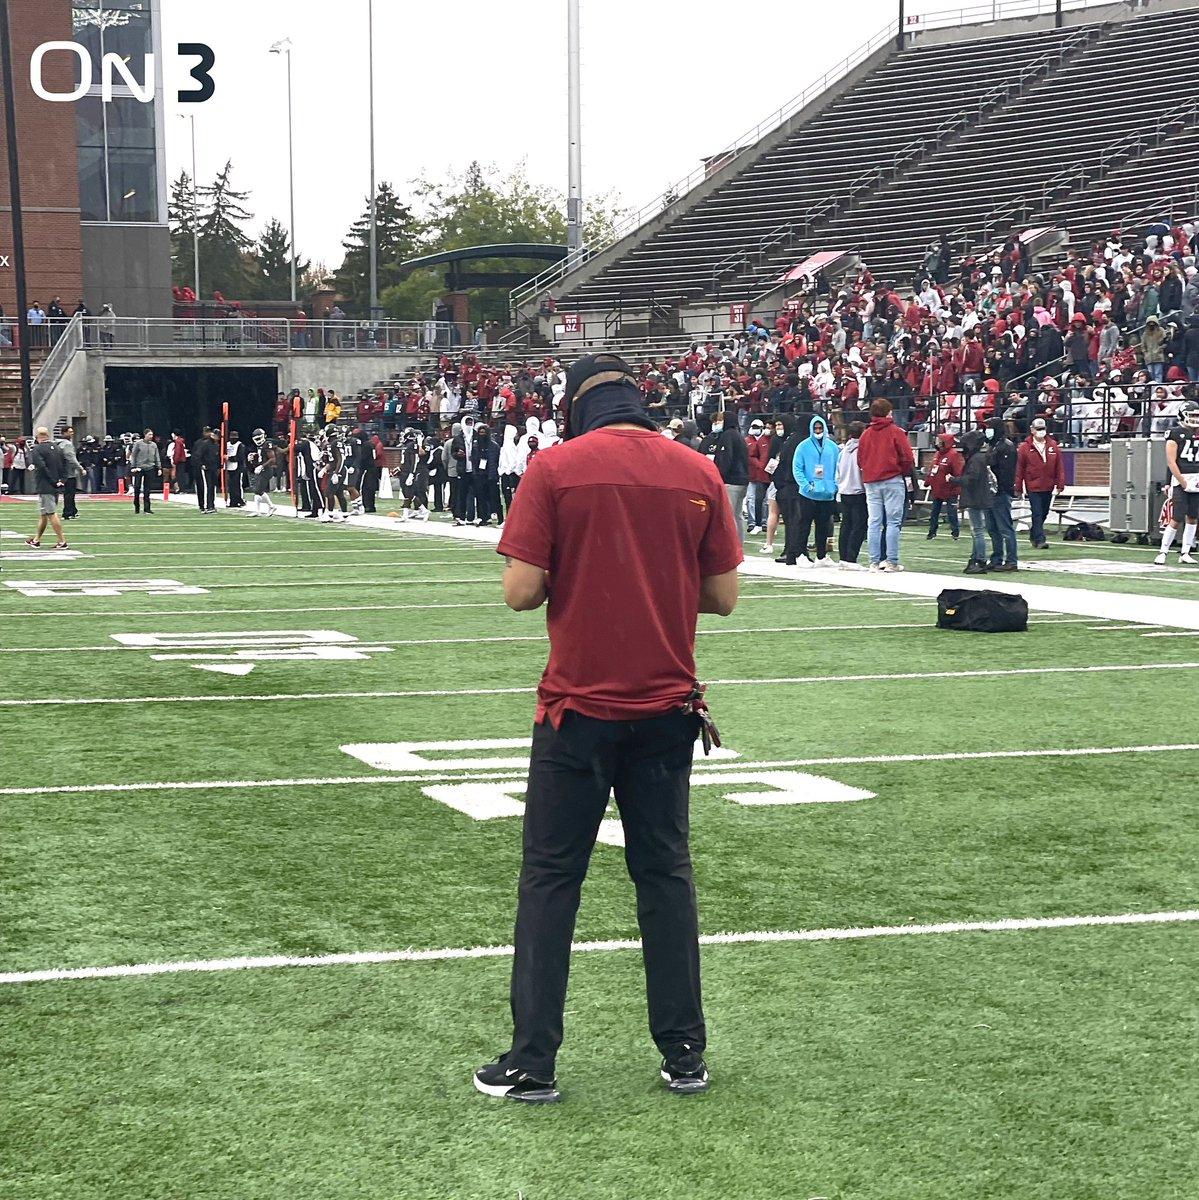 #USC Head Coach DONTE WILLIAMS❕  Trojan Face Wazzu at 12:30pm PT 🏈  📷 @On3USC #FightOn✌🏼